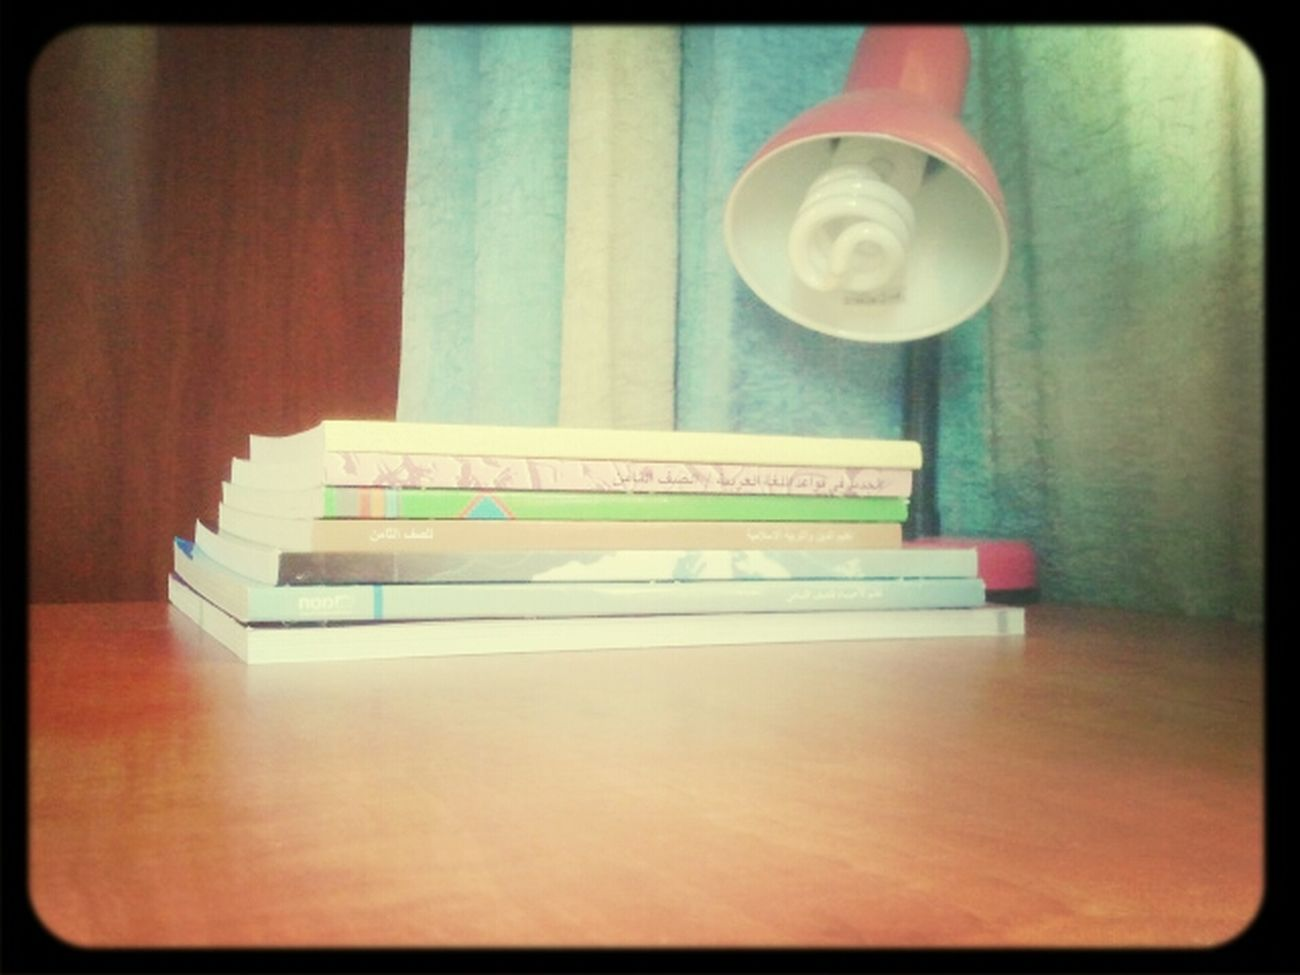 back to school :-C :-(